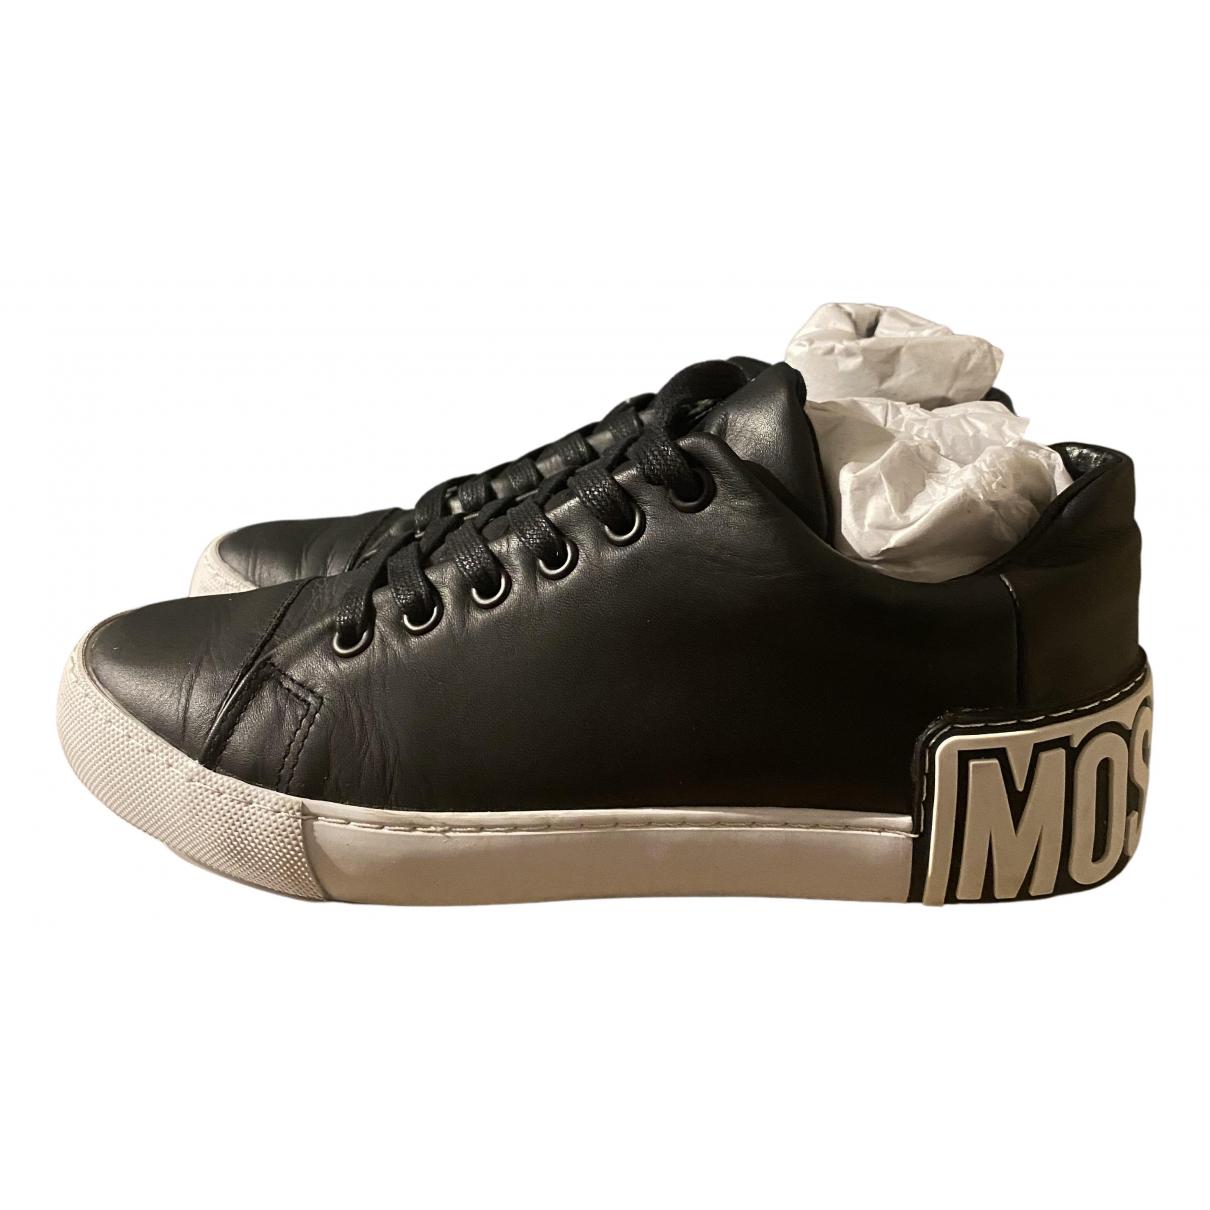 Moschino \N Sneakers in  Schwarz Leder